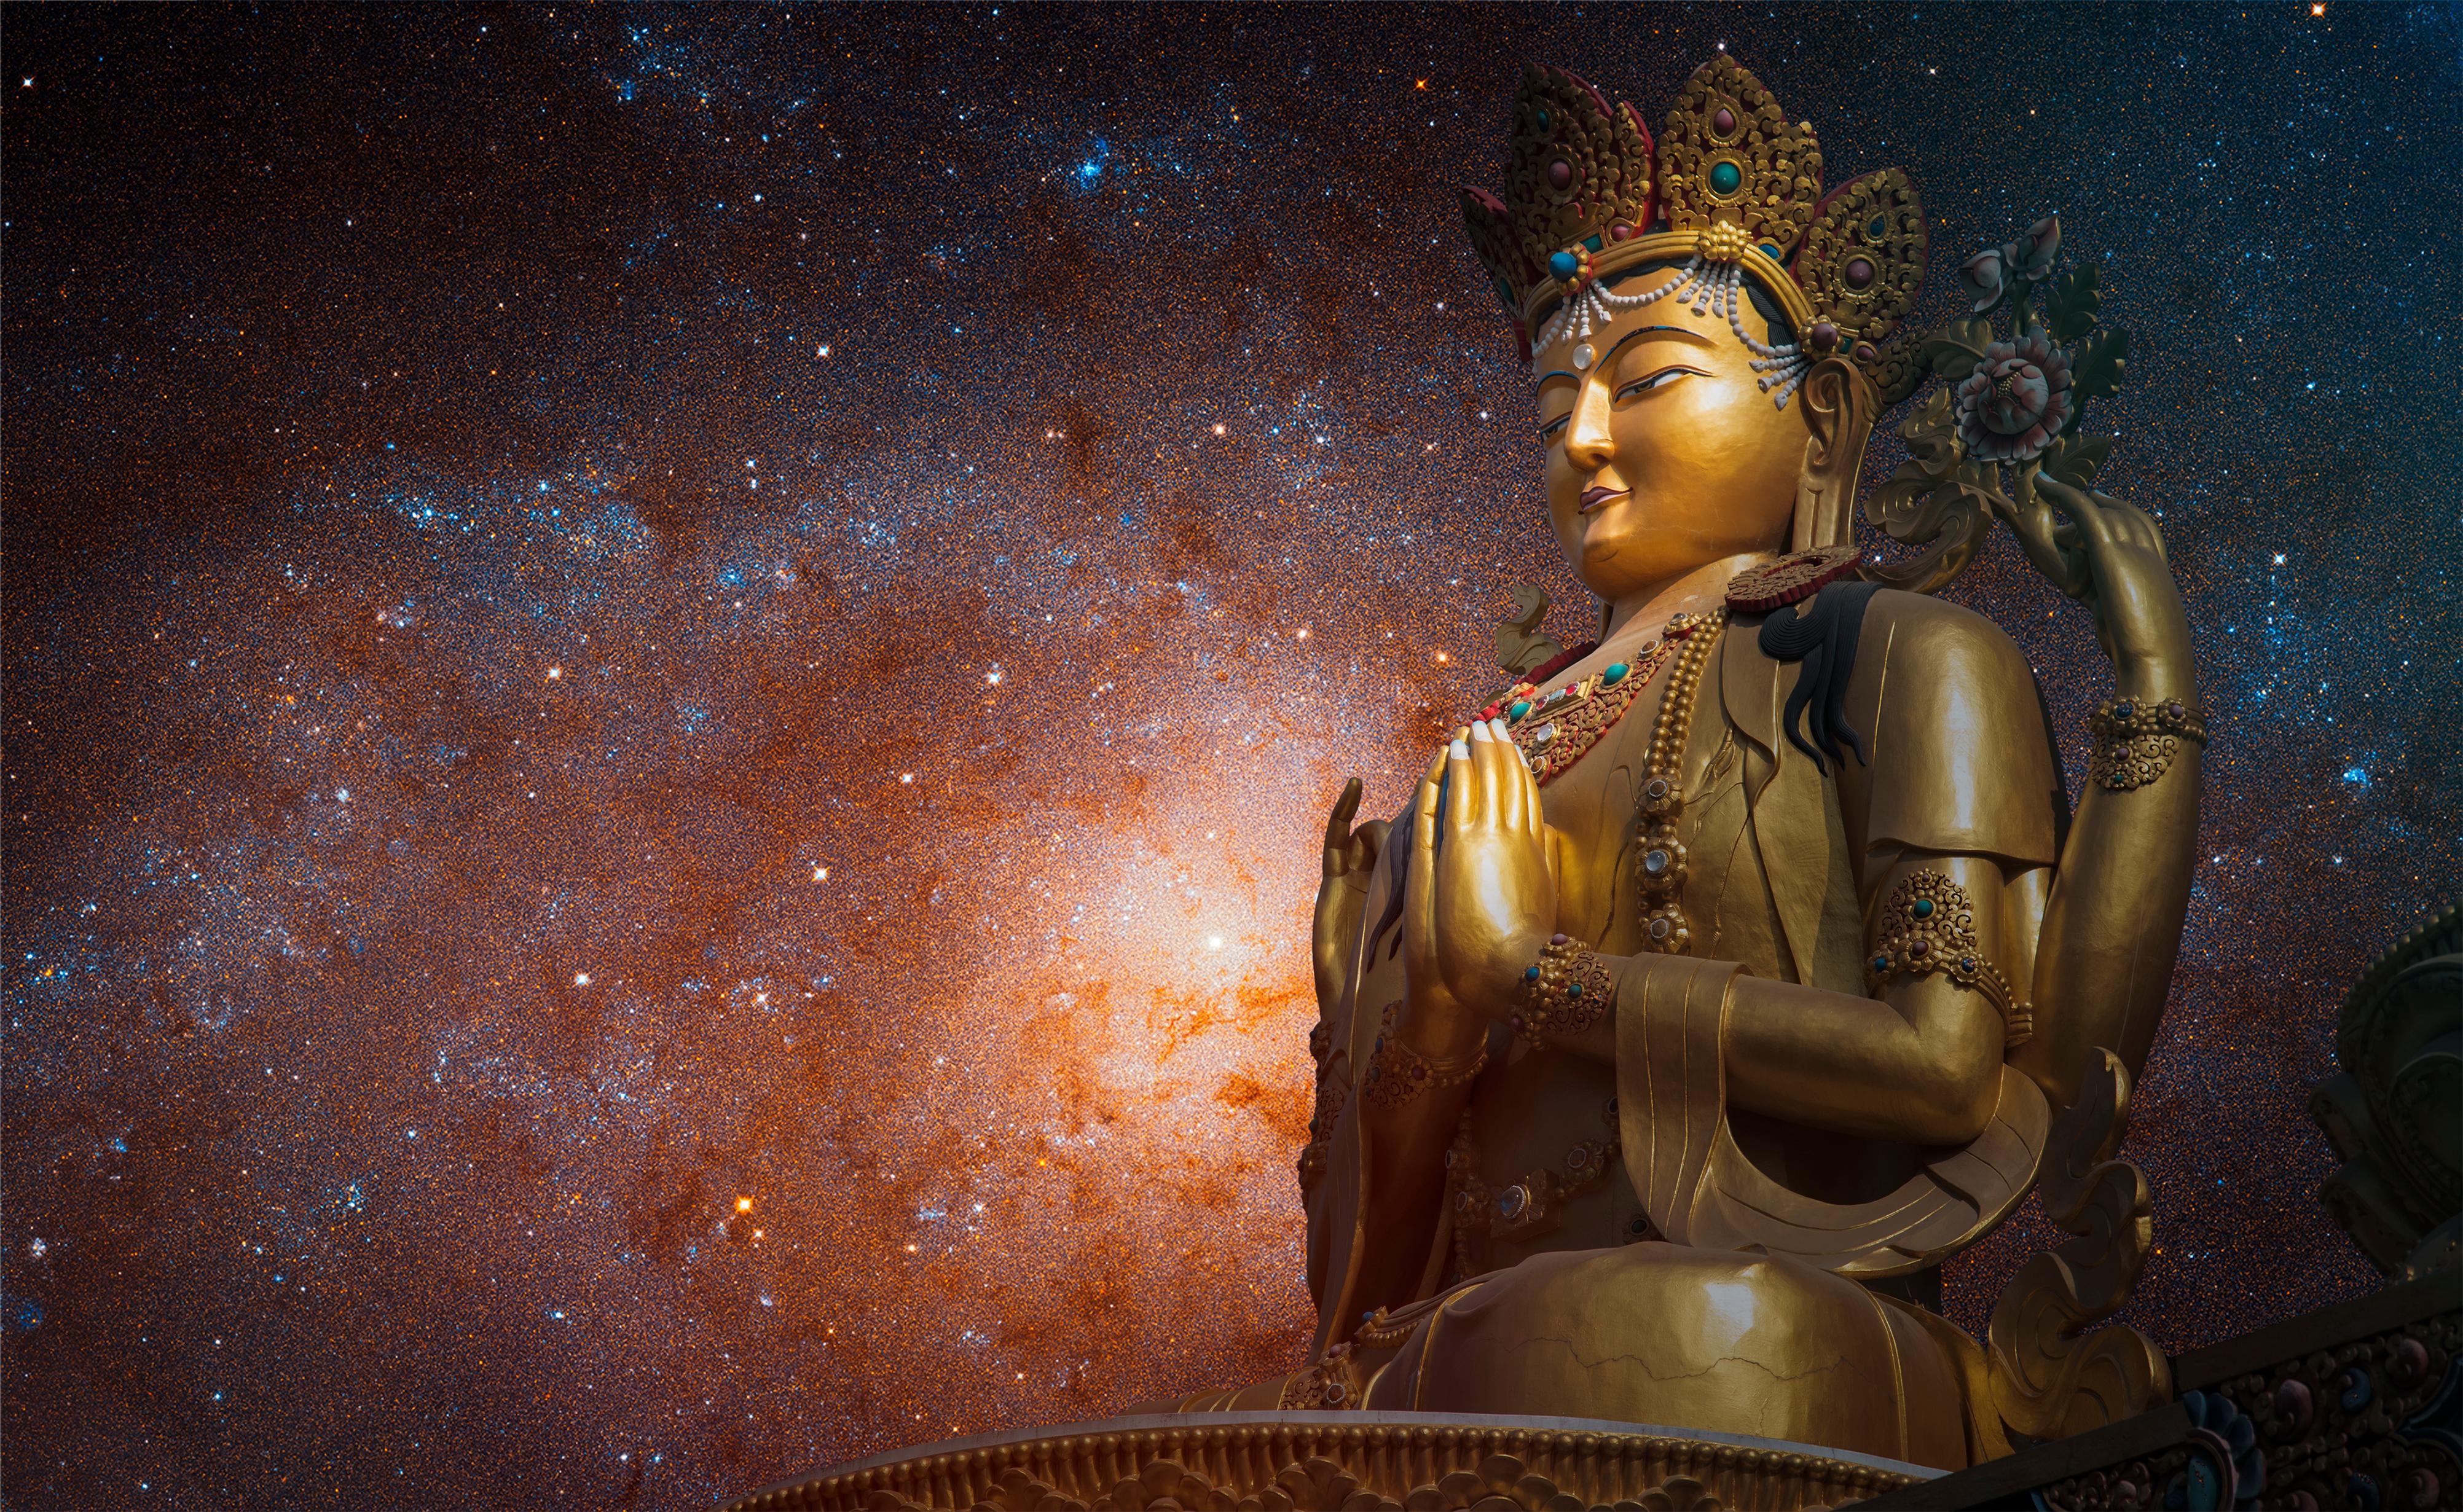 celebrate, health, uplift, kirtan, dharma, yoga, meditation, kundalini, bodywork, movement, psychology, New Year, Spiritual, buddhism, guru, gurus, Vajra, Krishna, enlightenment, awakening, Vinyasa, Nidra, Mantra, social justice, environment, Chant, Chanting, meditation, holistic, mind and body, astrology, shamanism